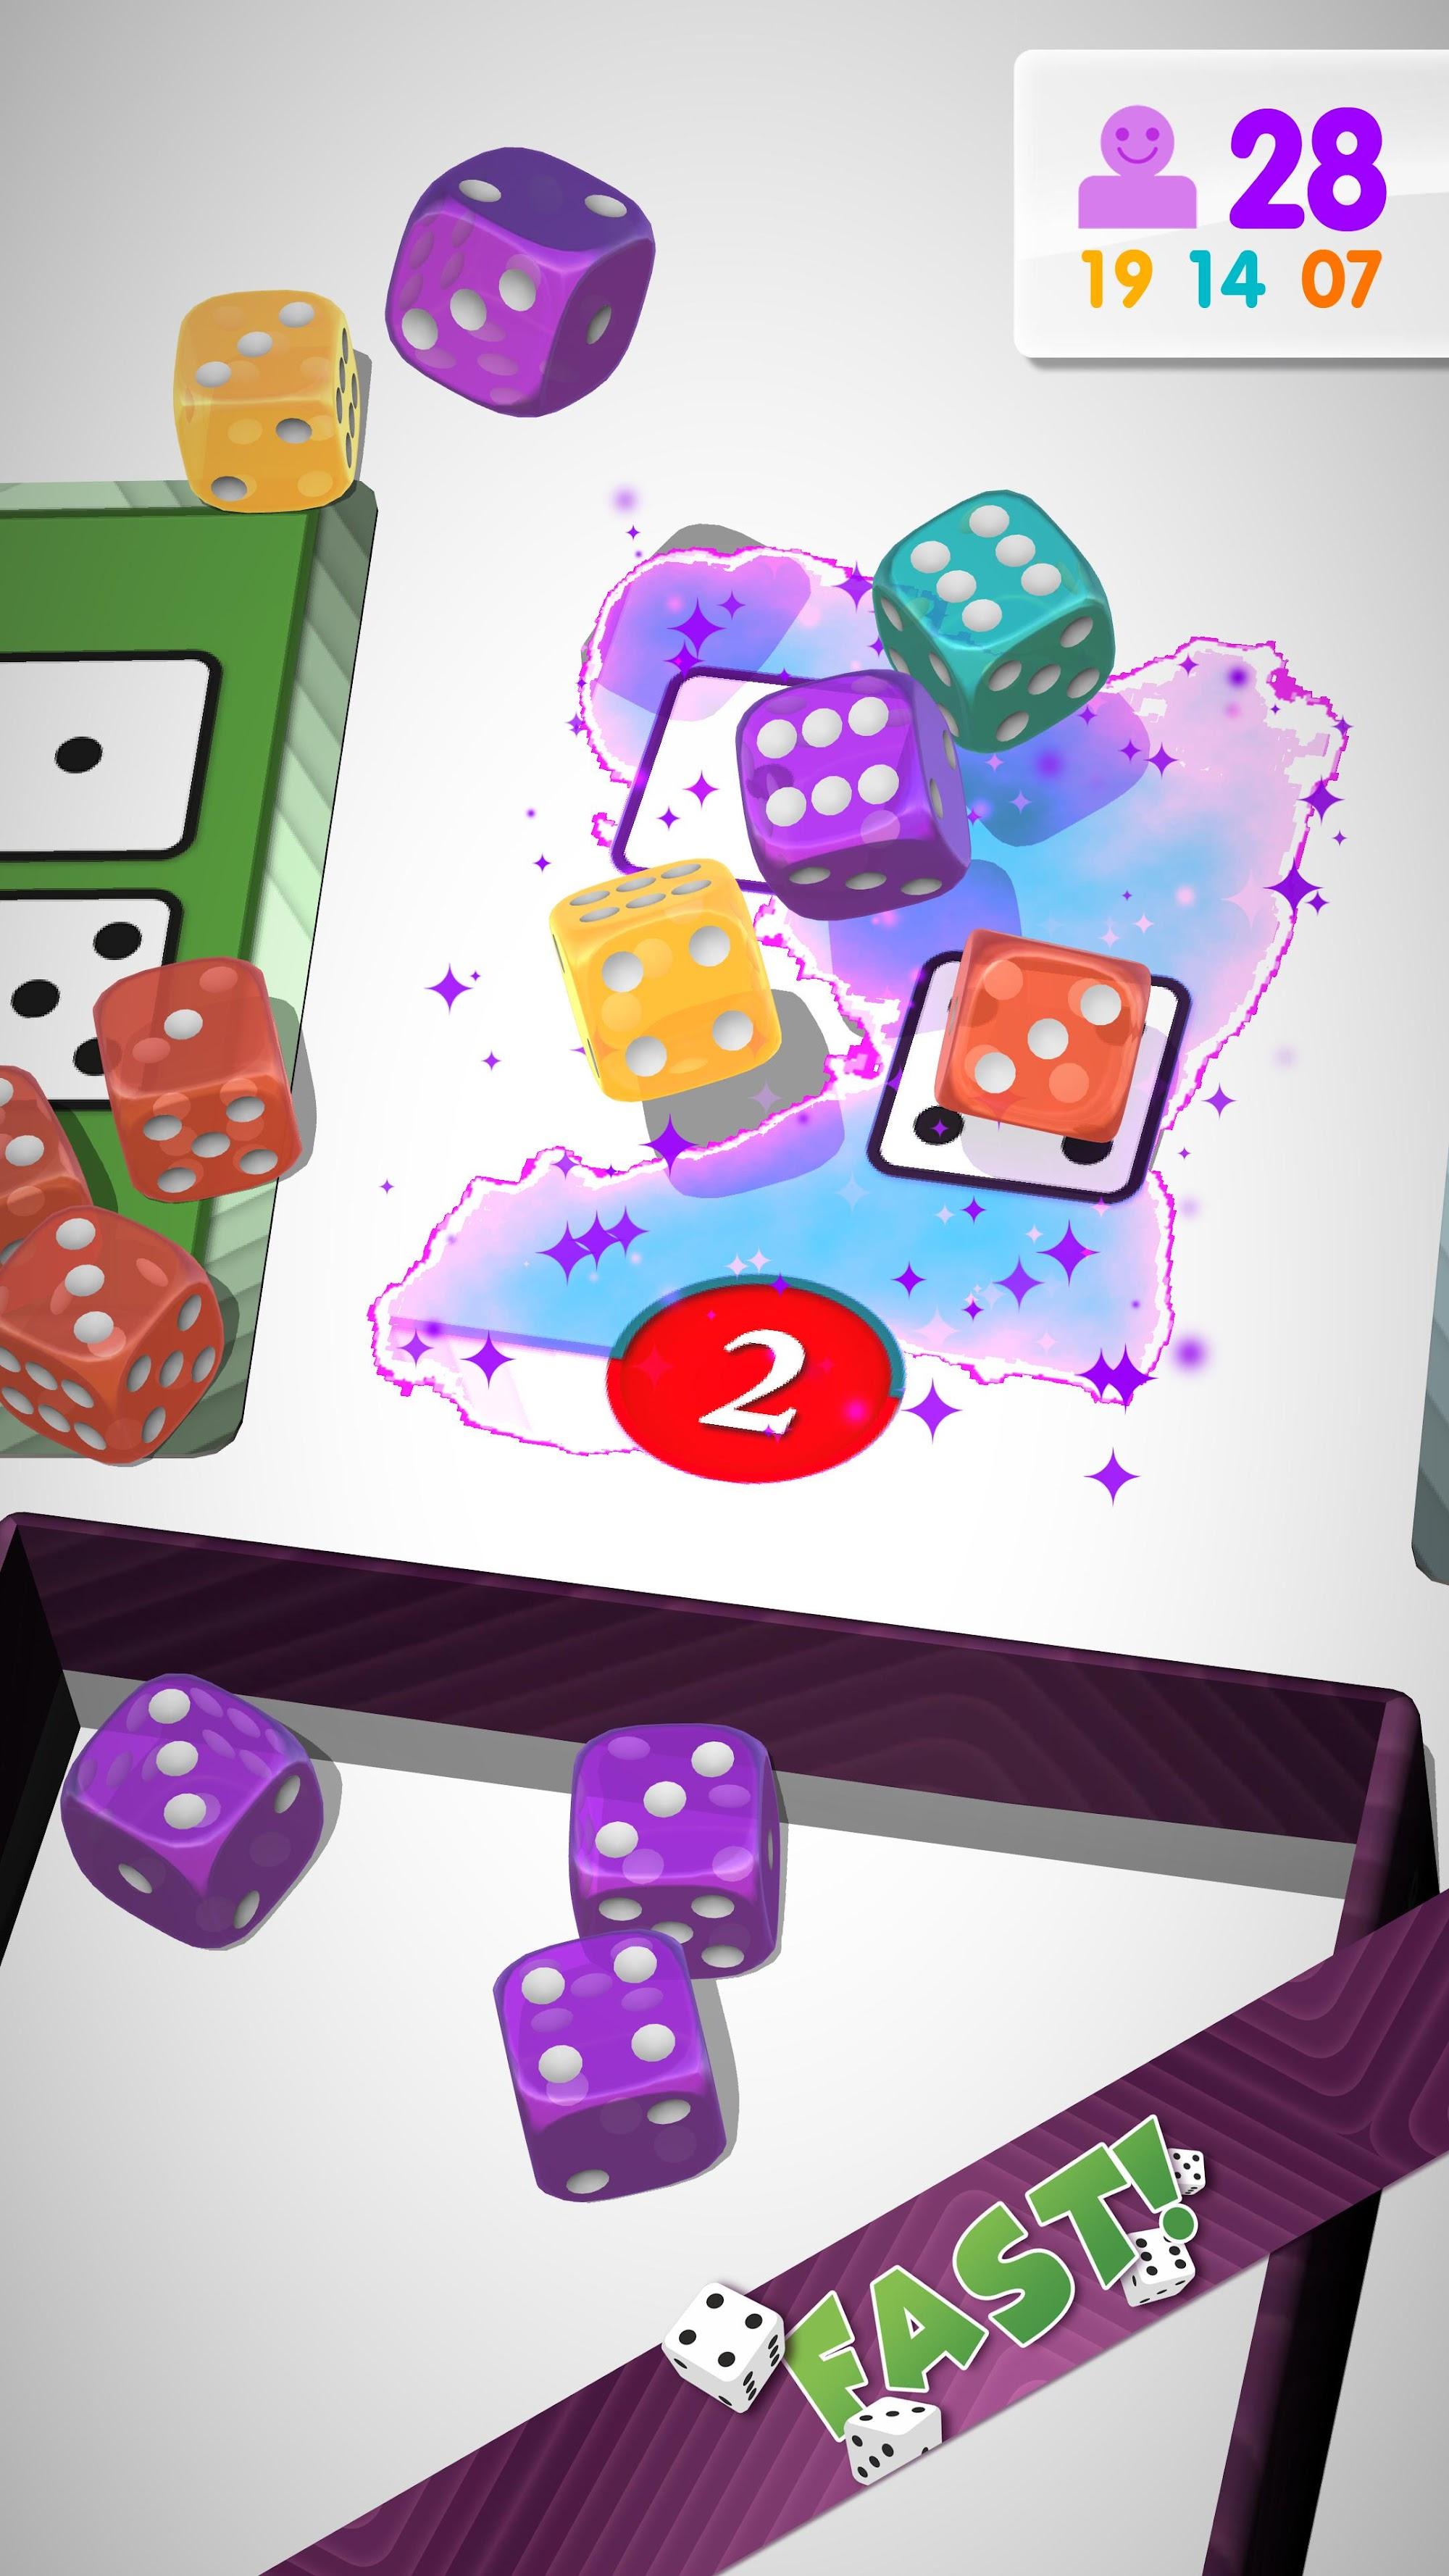 Roll For It! screenshot #2